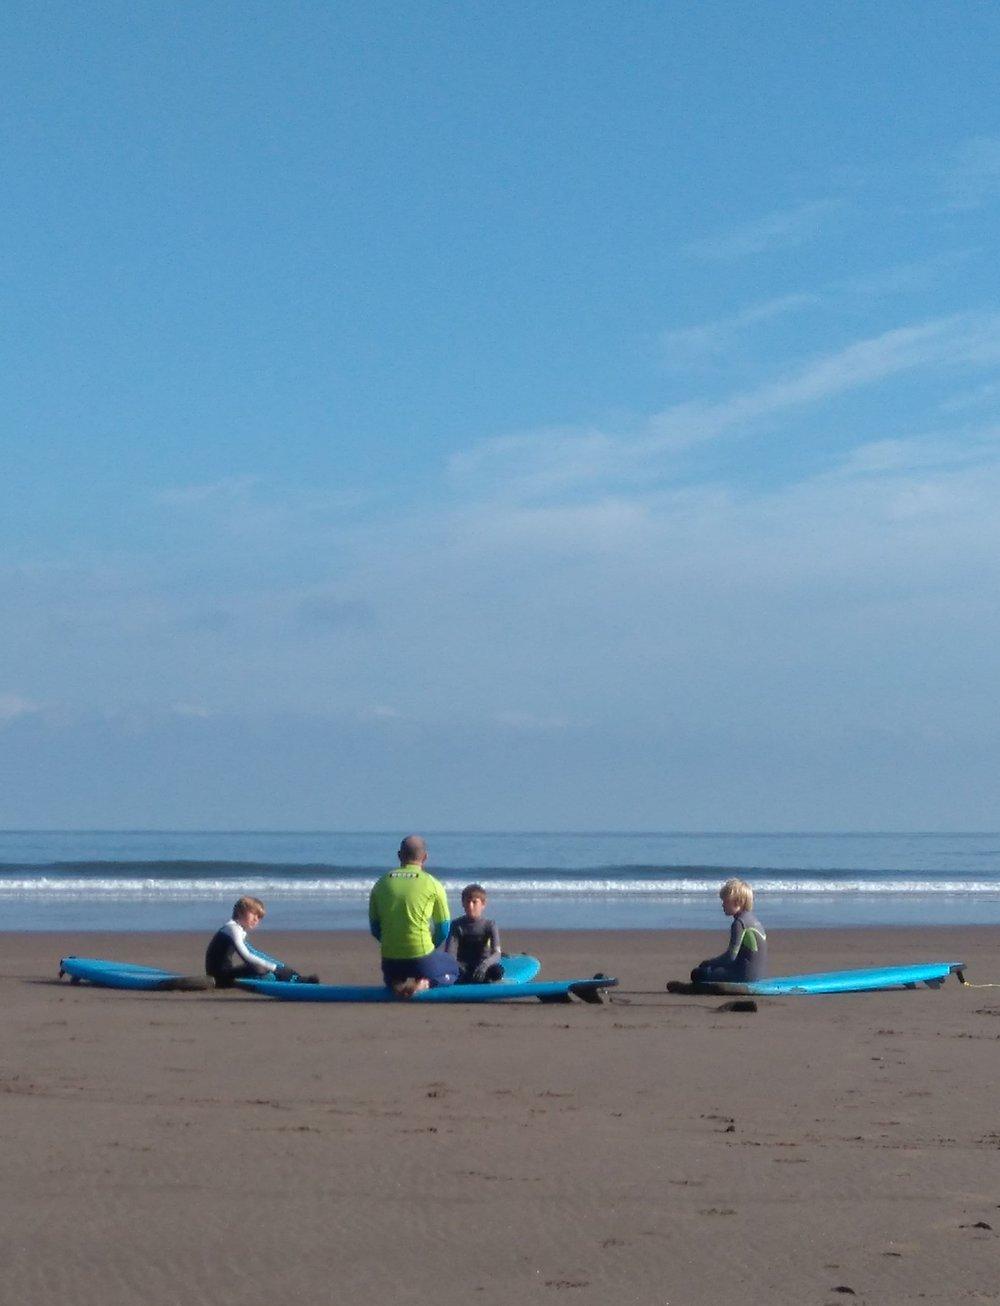 surfbeach.jpg